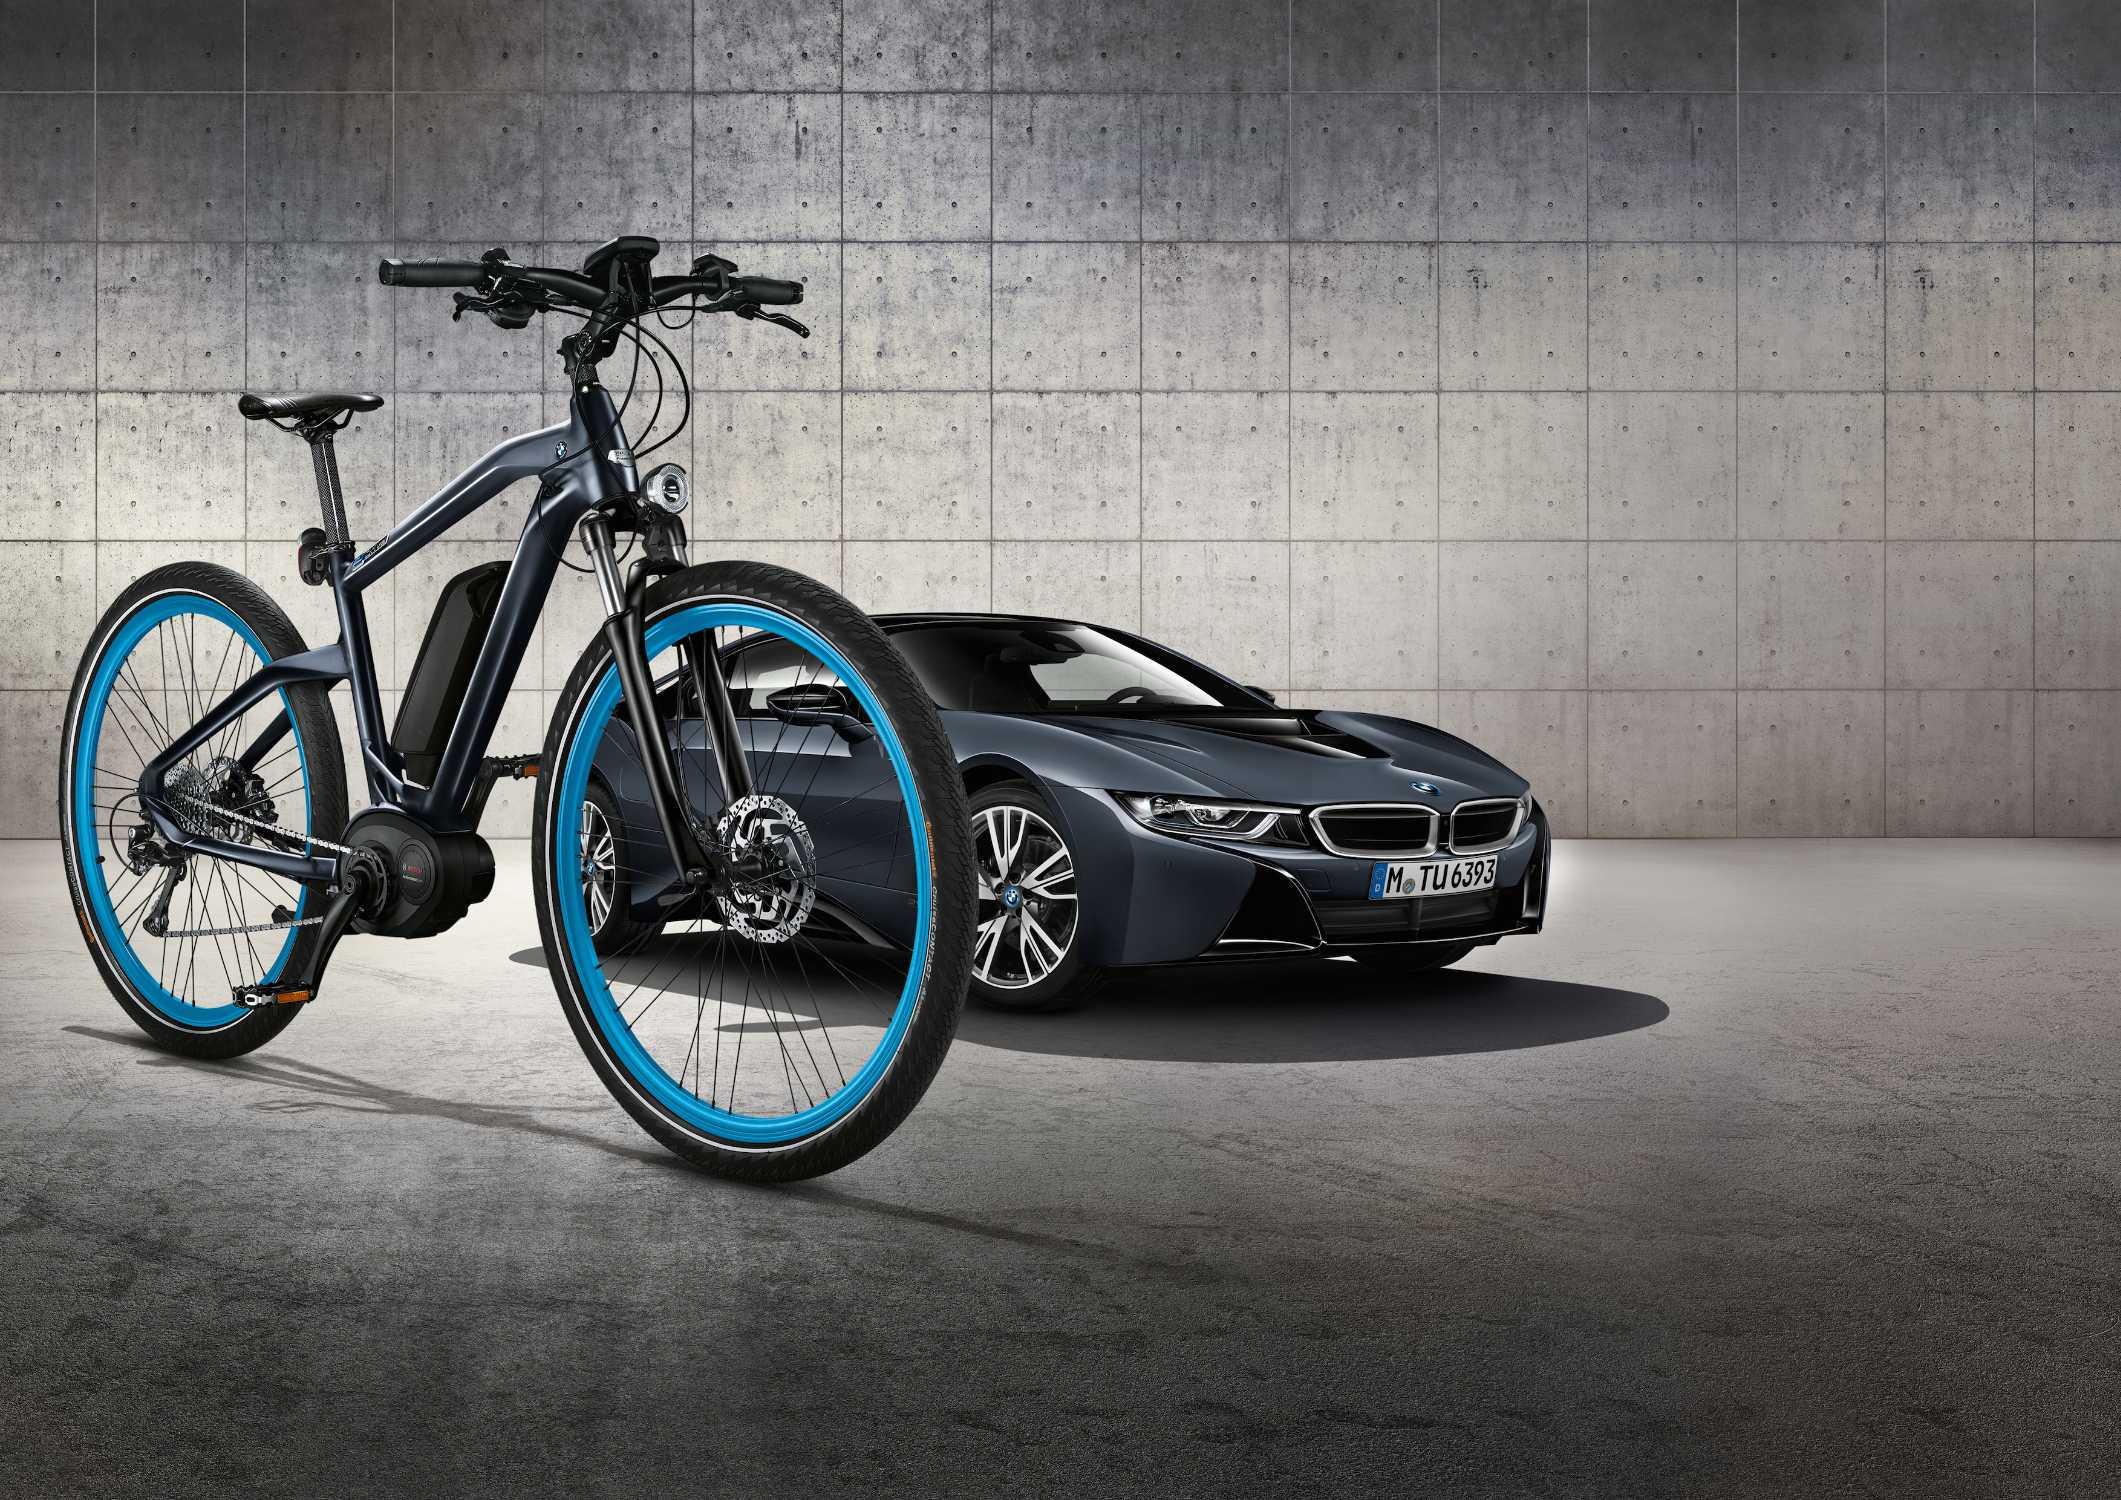 The Bmw Cruise E Bike Limited Edition Exclusive Colour Scheme Matches Bmw I8 Protonic Dark Silver Edition